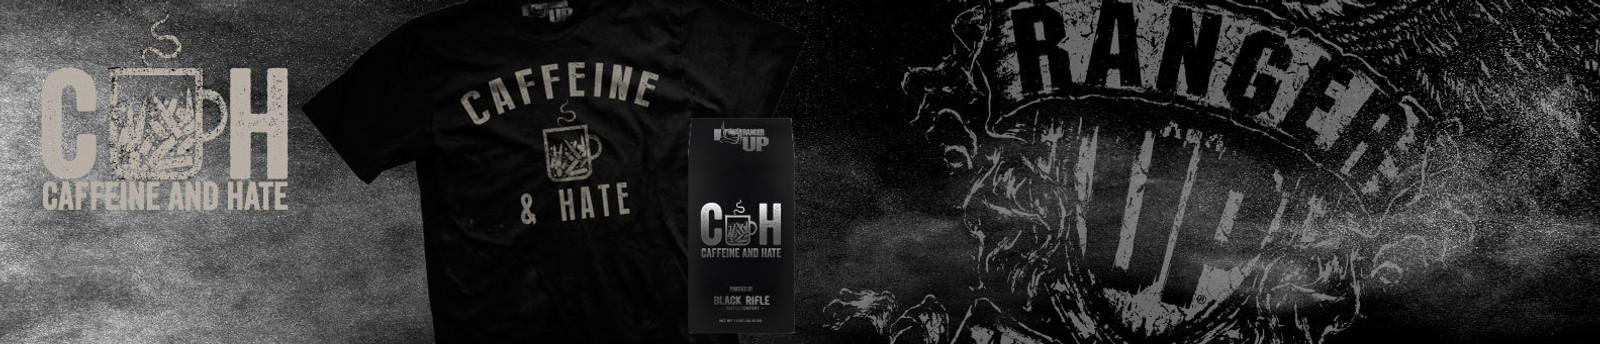 Caffeine and Hate